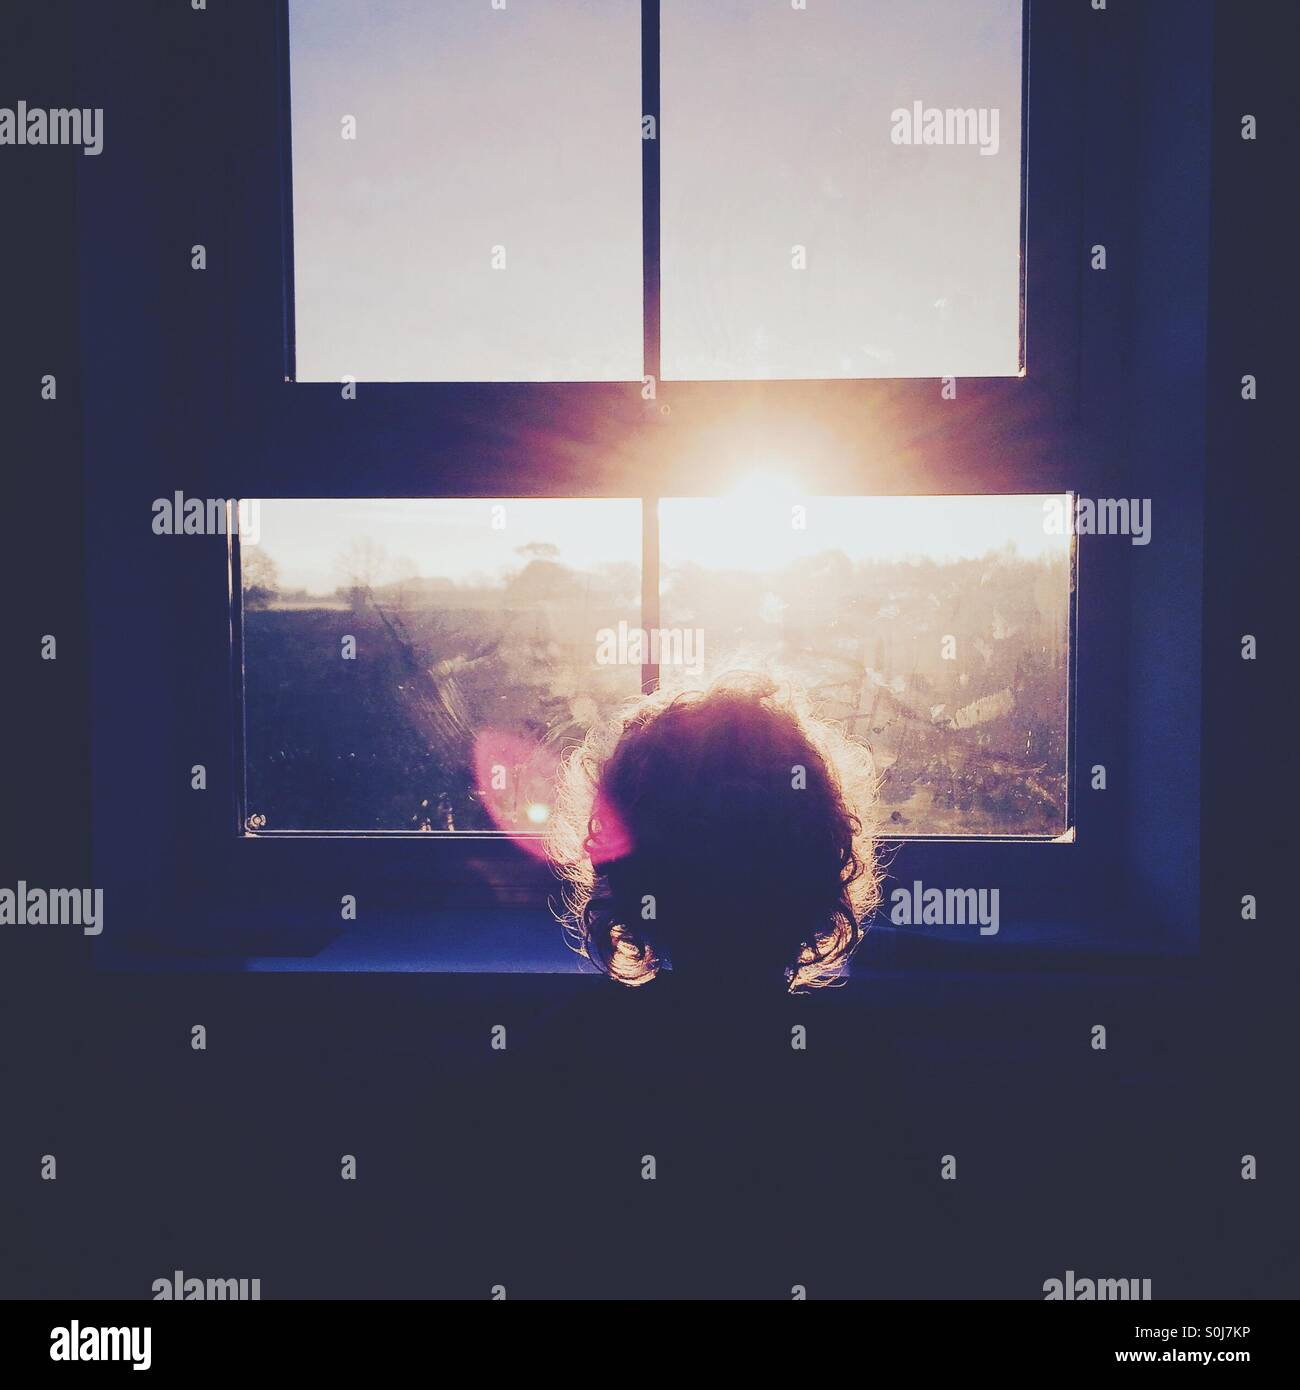 Boy watching sunrise through window - Stock Image